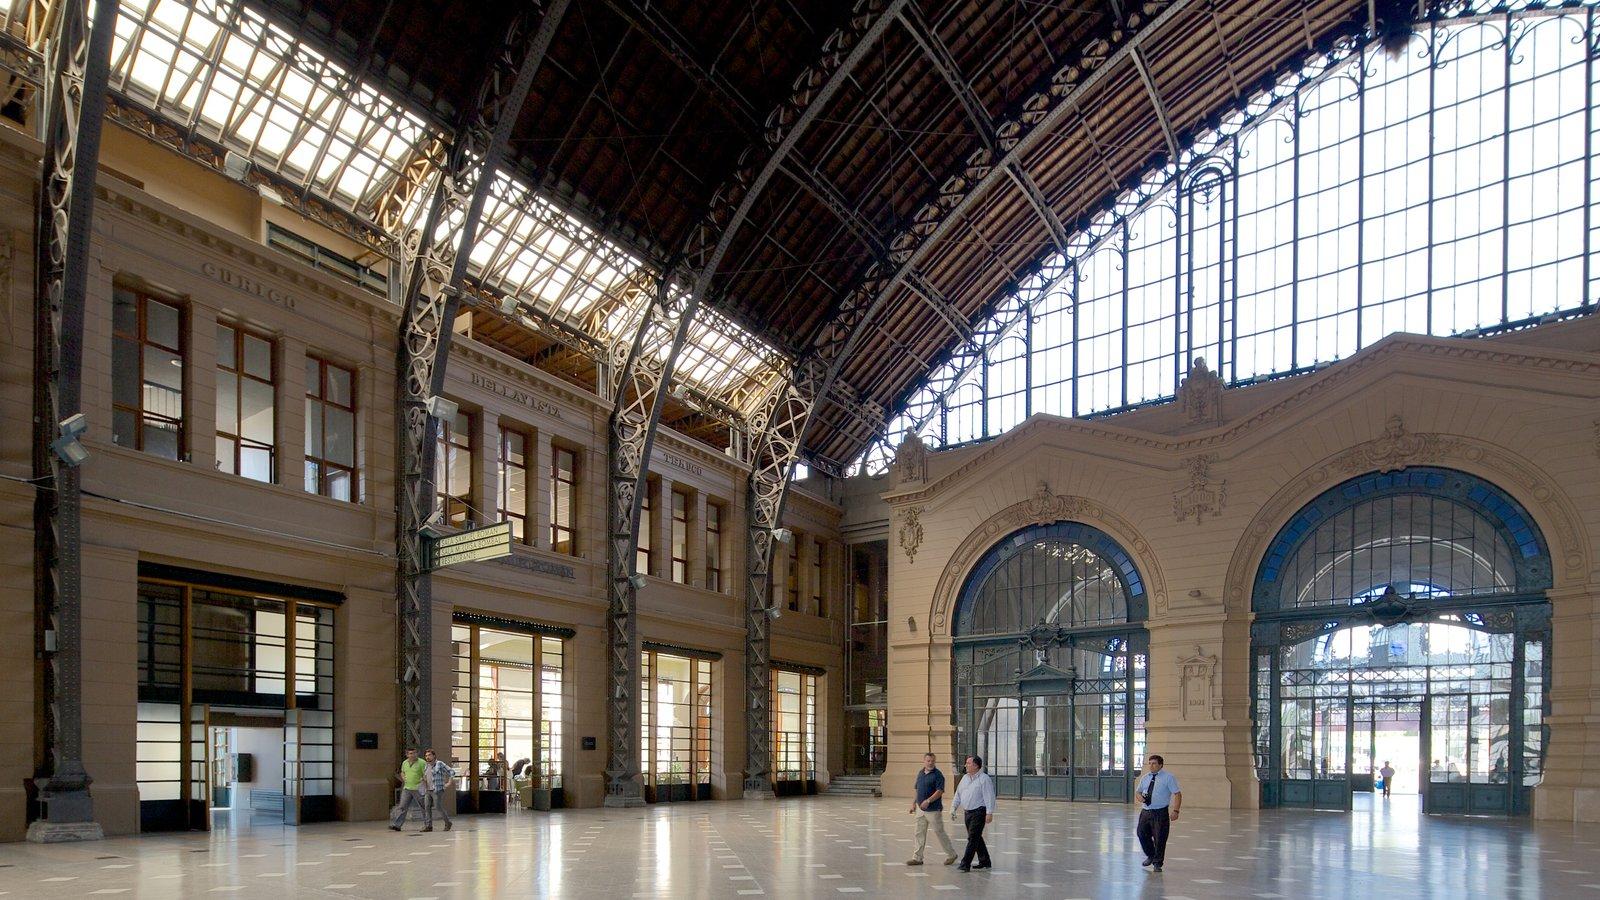 Santiago que inclui vistas internas e arquitetura de patrimônio